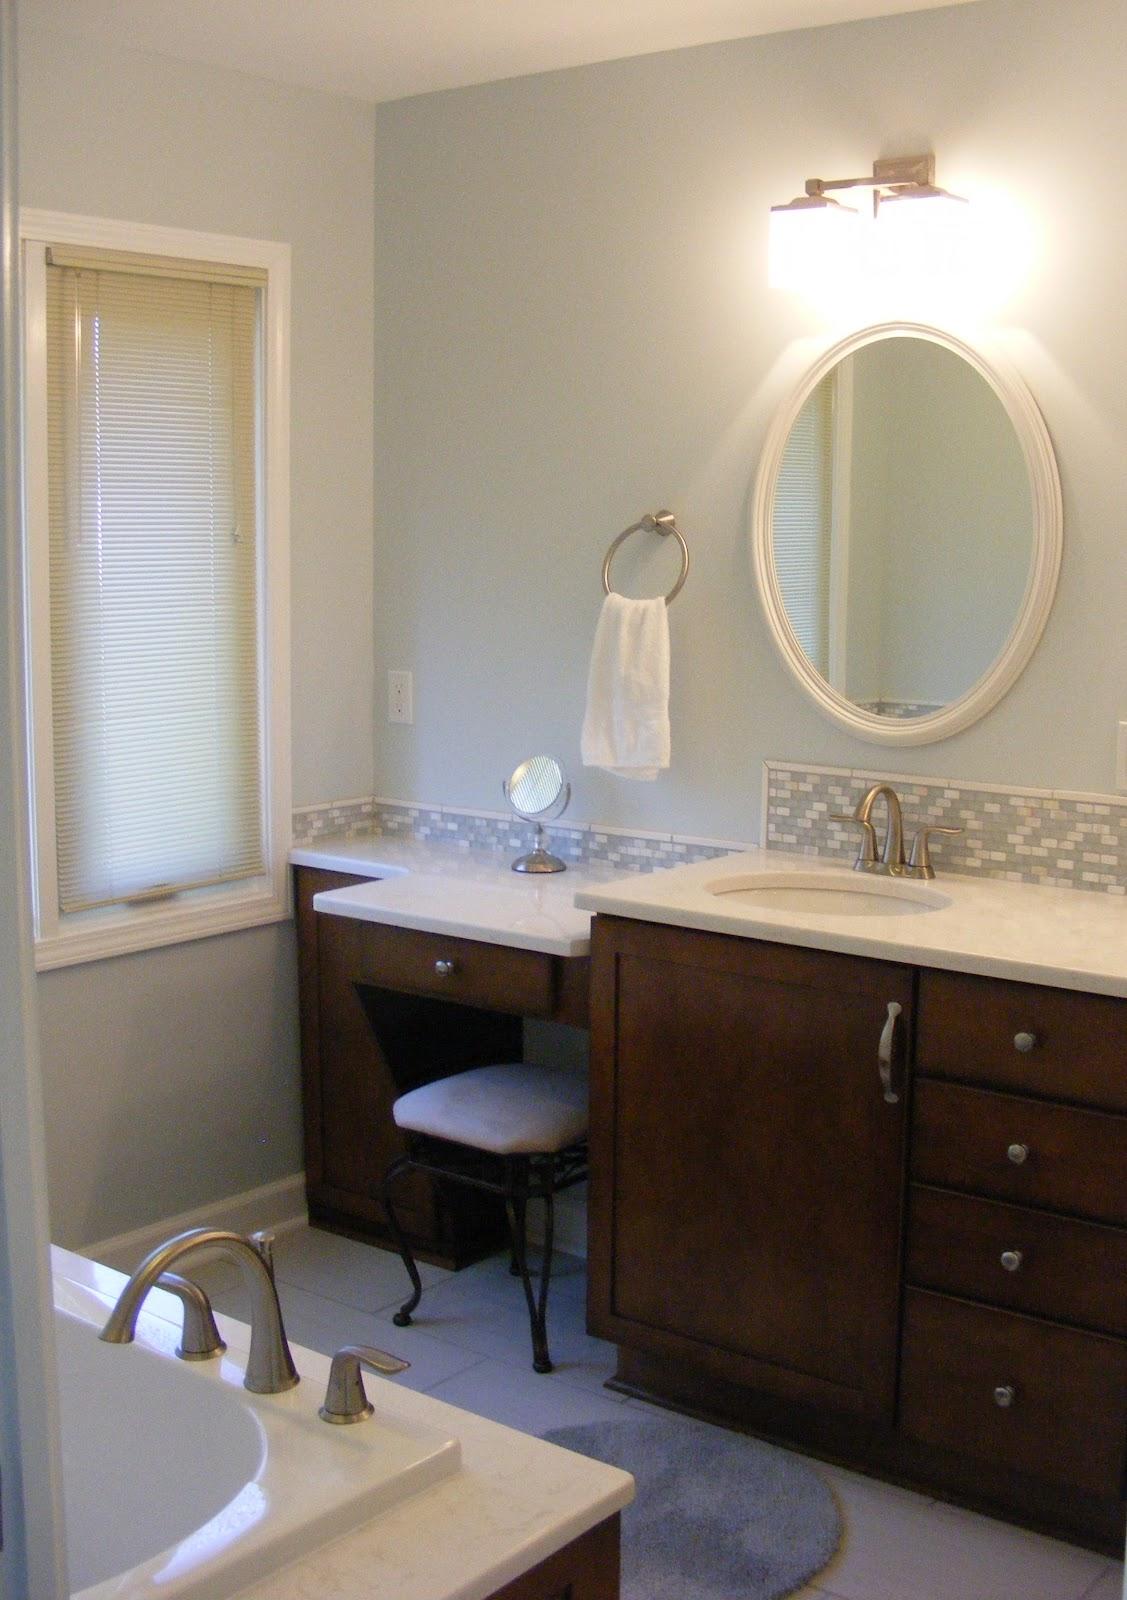 Merillat bathroom vanity cabinets